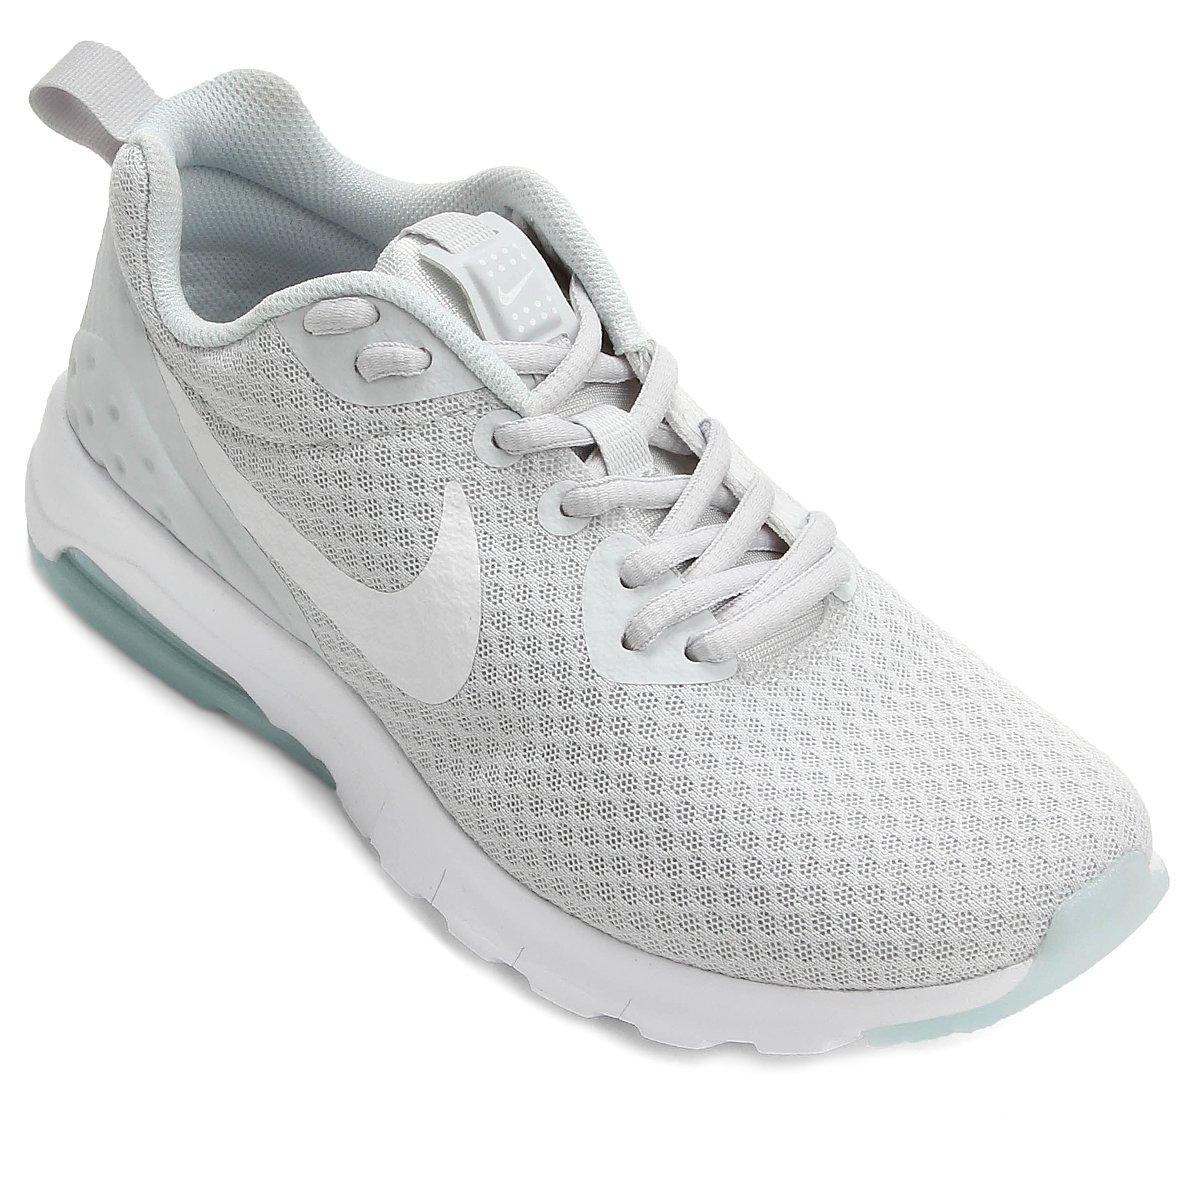 Tênis Nike Air Max Motion Lw Feminino - Compre Agora  f7119a620f4b1